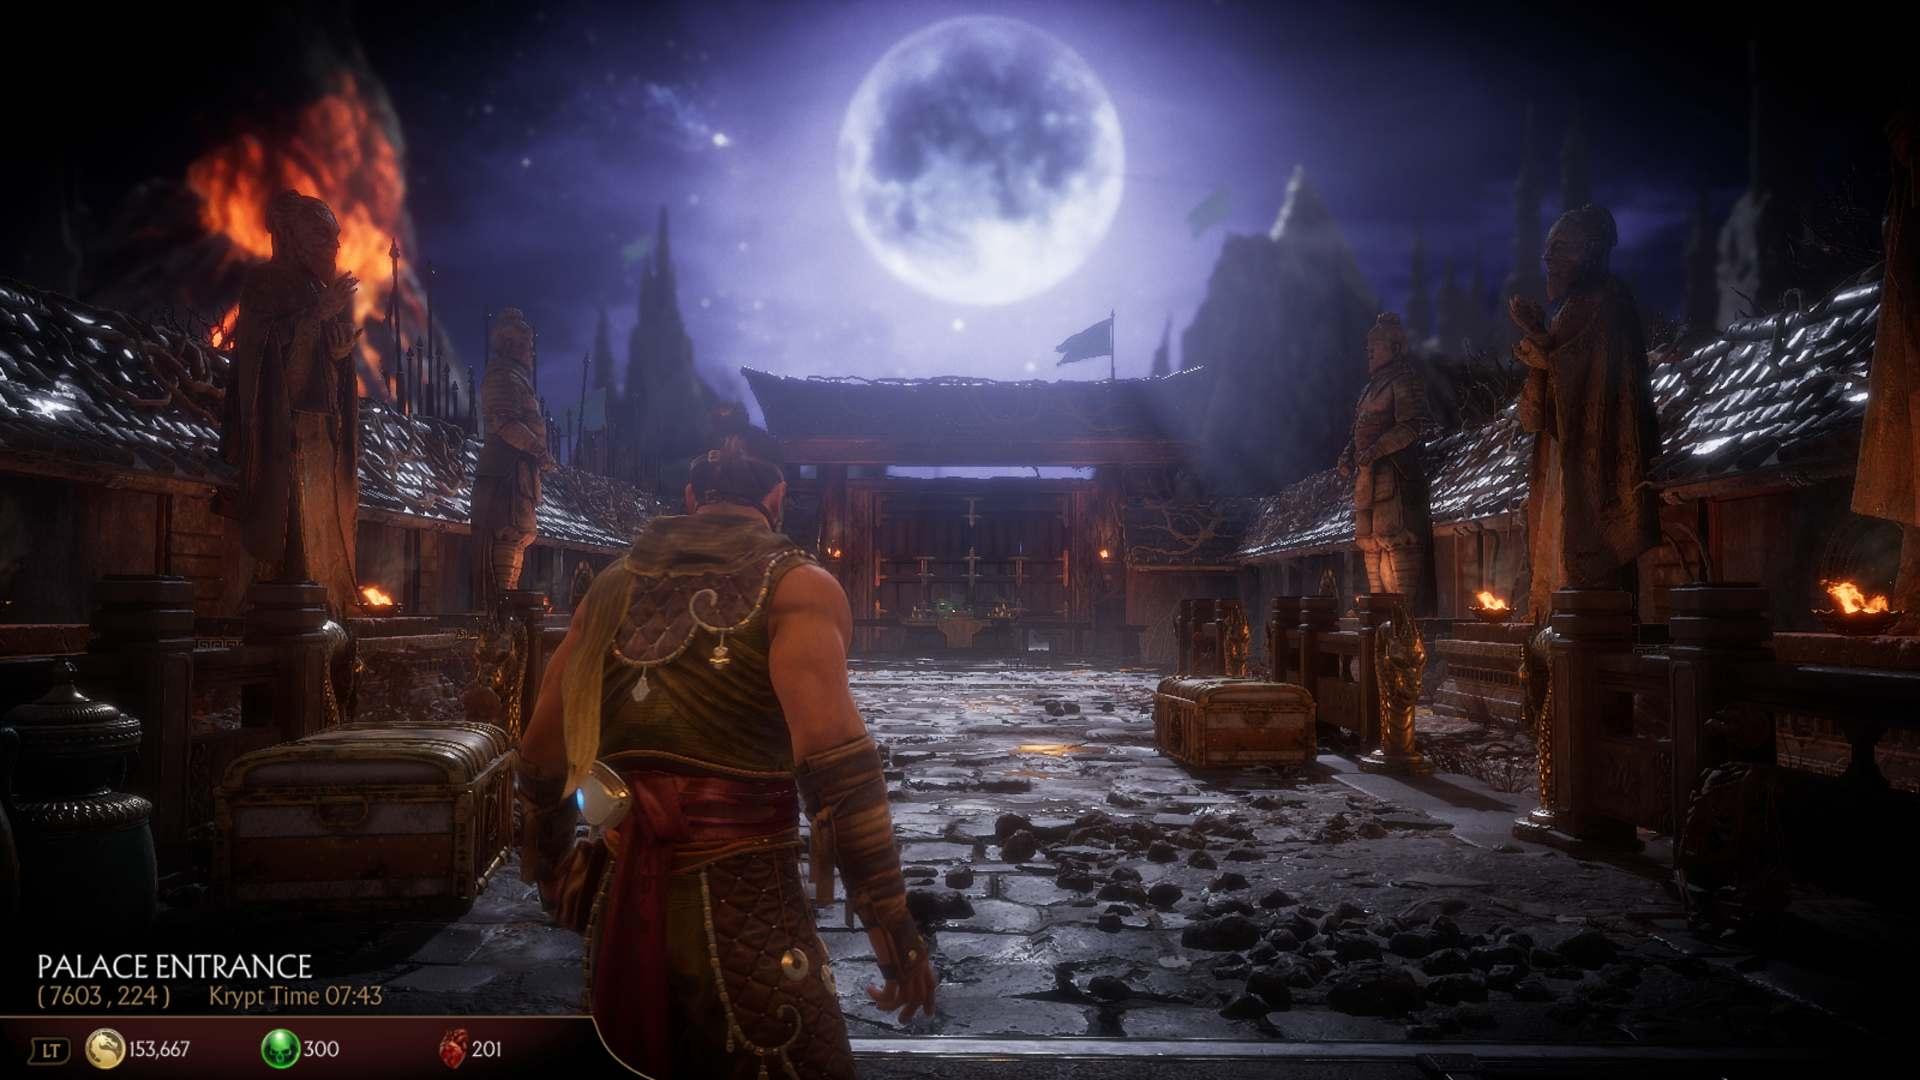 Mortal Kombat 11 Krypt Palace Entrance